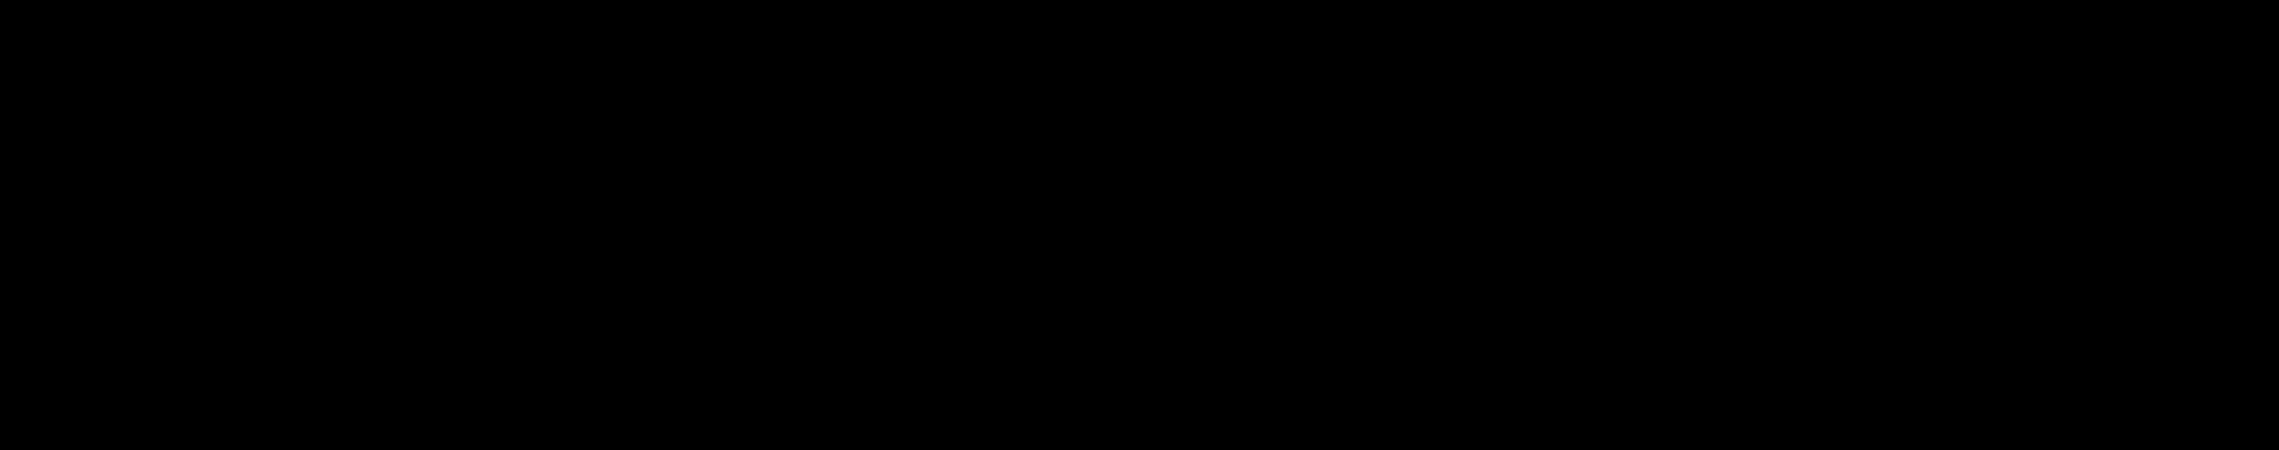 N-(2-(2-(2-(2-Aminoethoxy)ethoxy)ethoxy)ethyl)-2-chloroacetamide trifluoroacetate